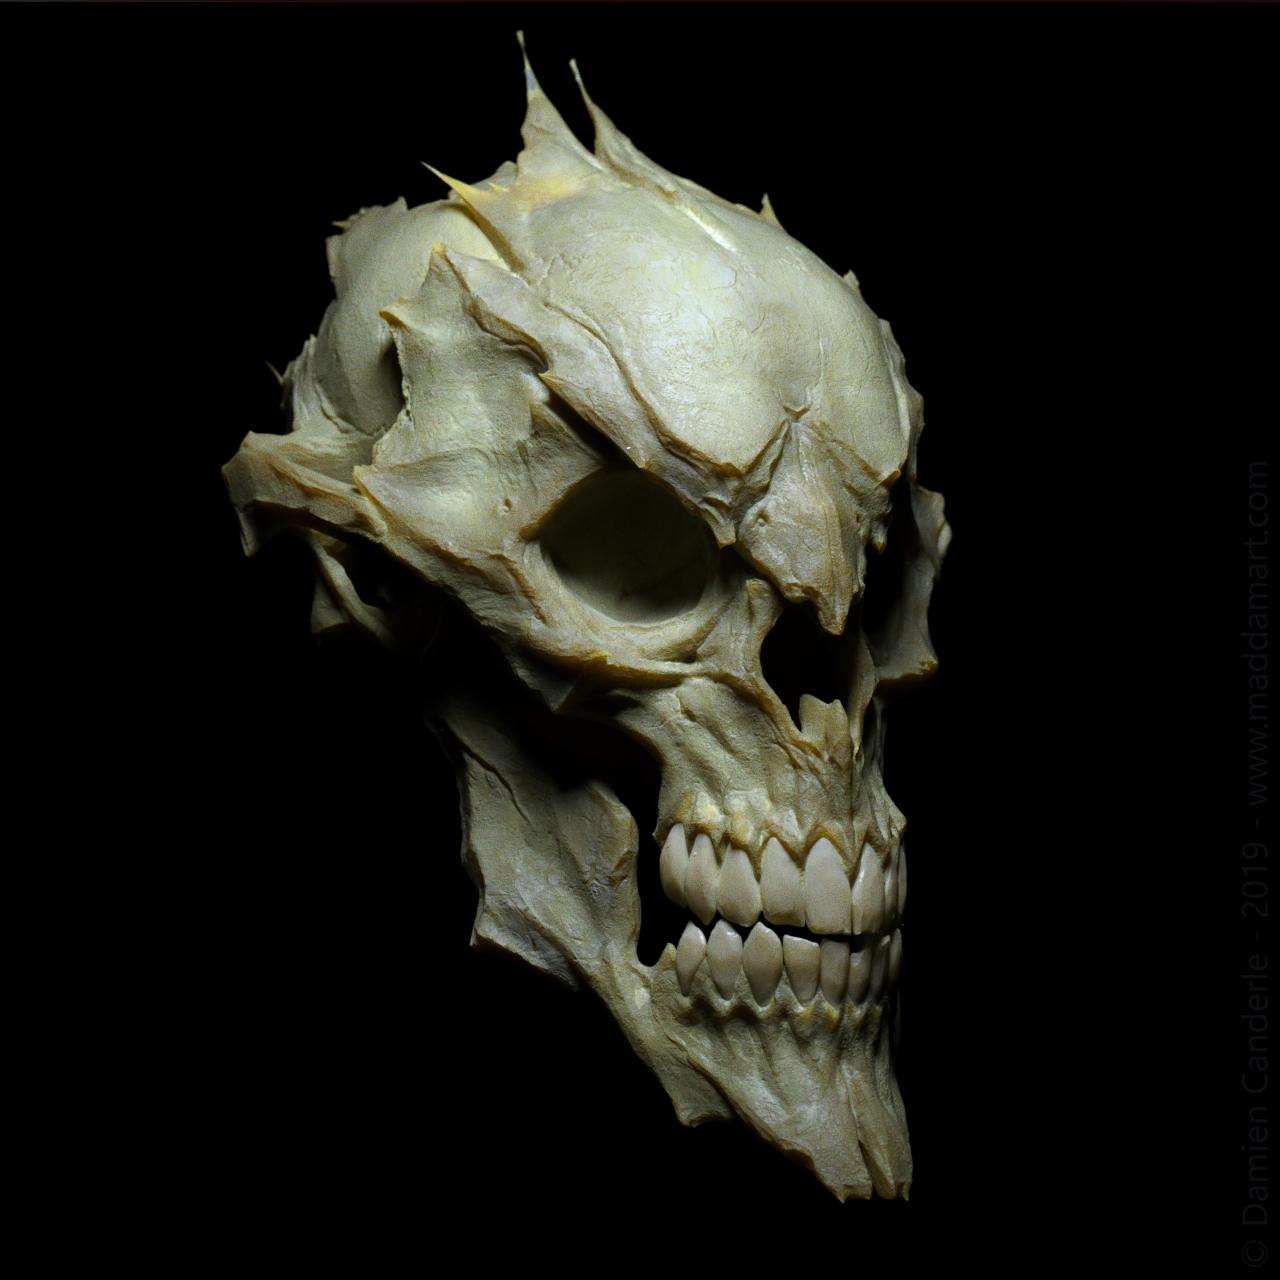 Canderled alien skull 1 75989ac6 6y63